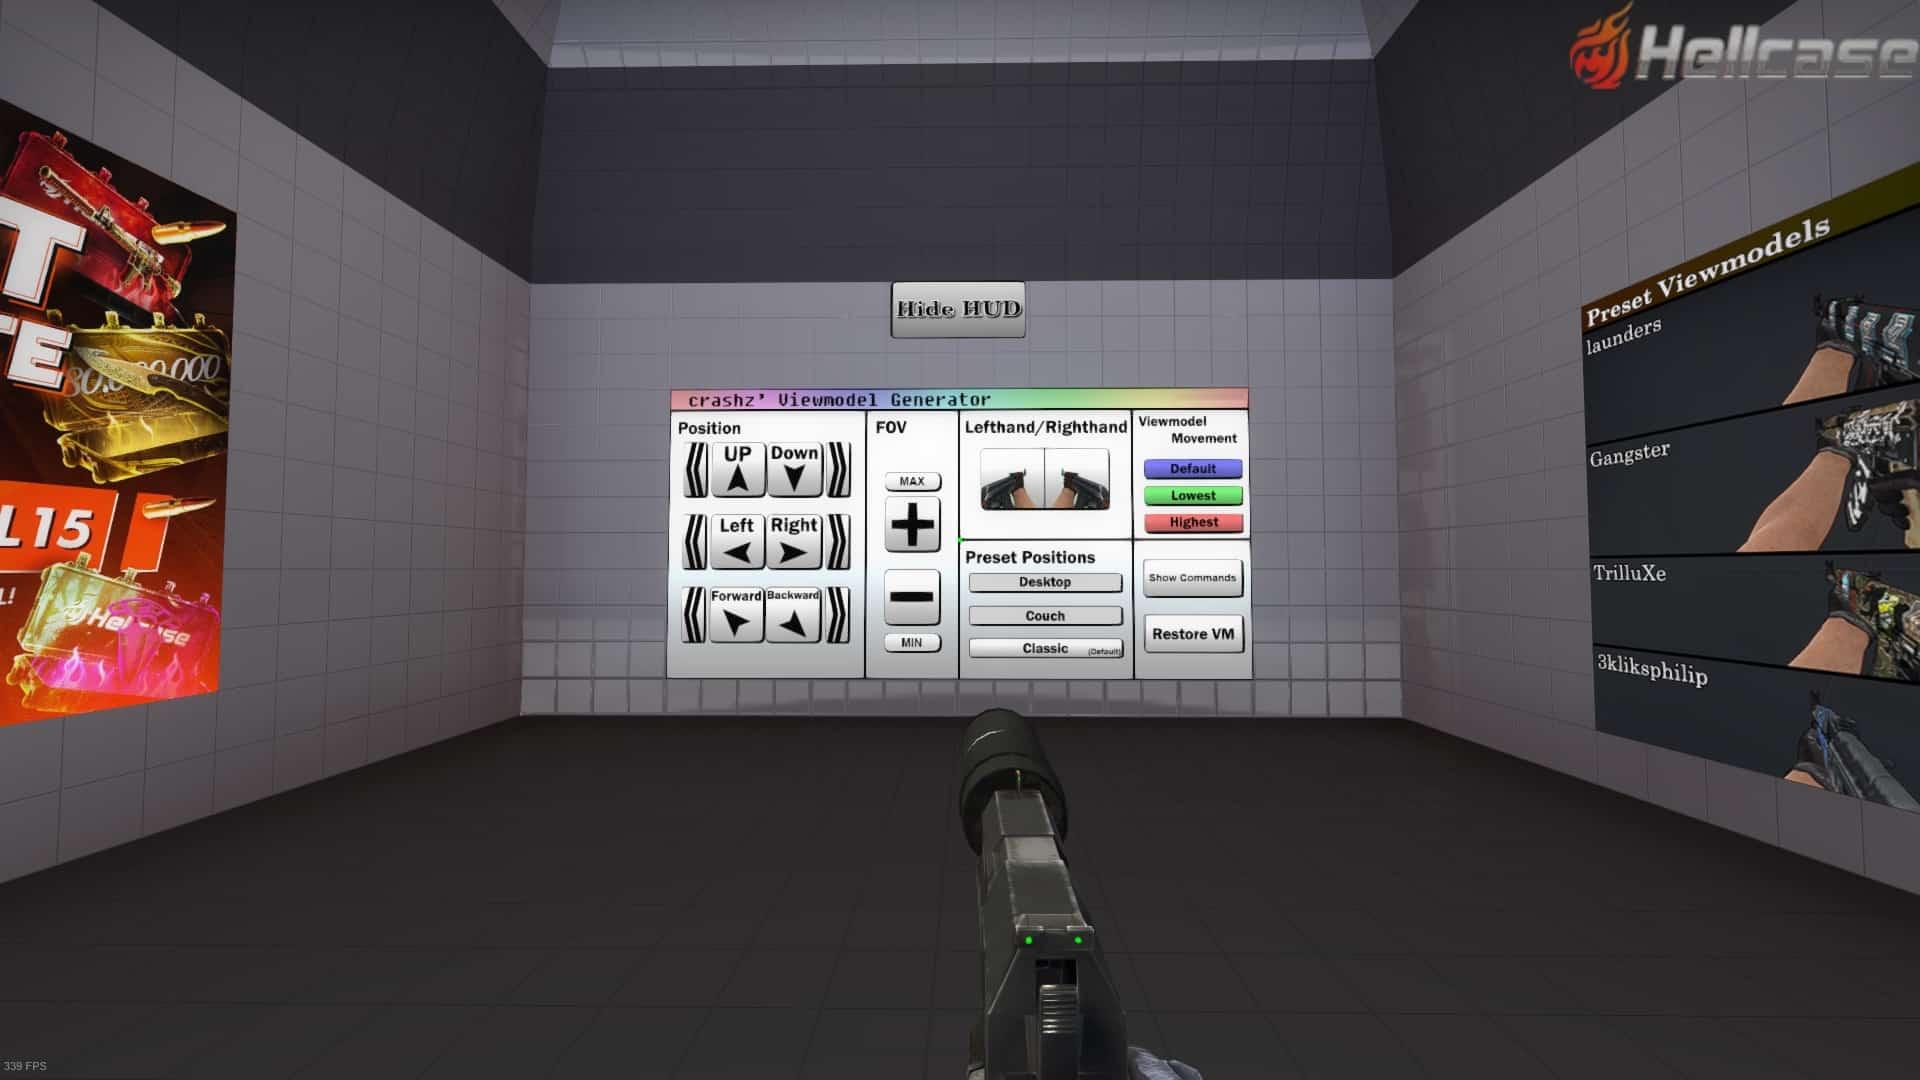 crashz viewmodel generator